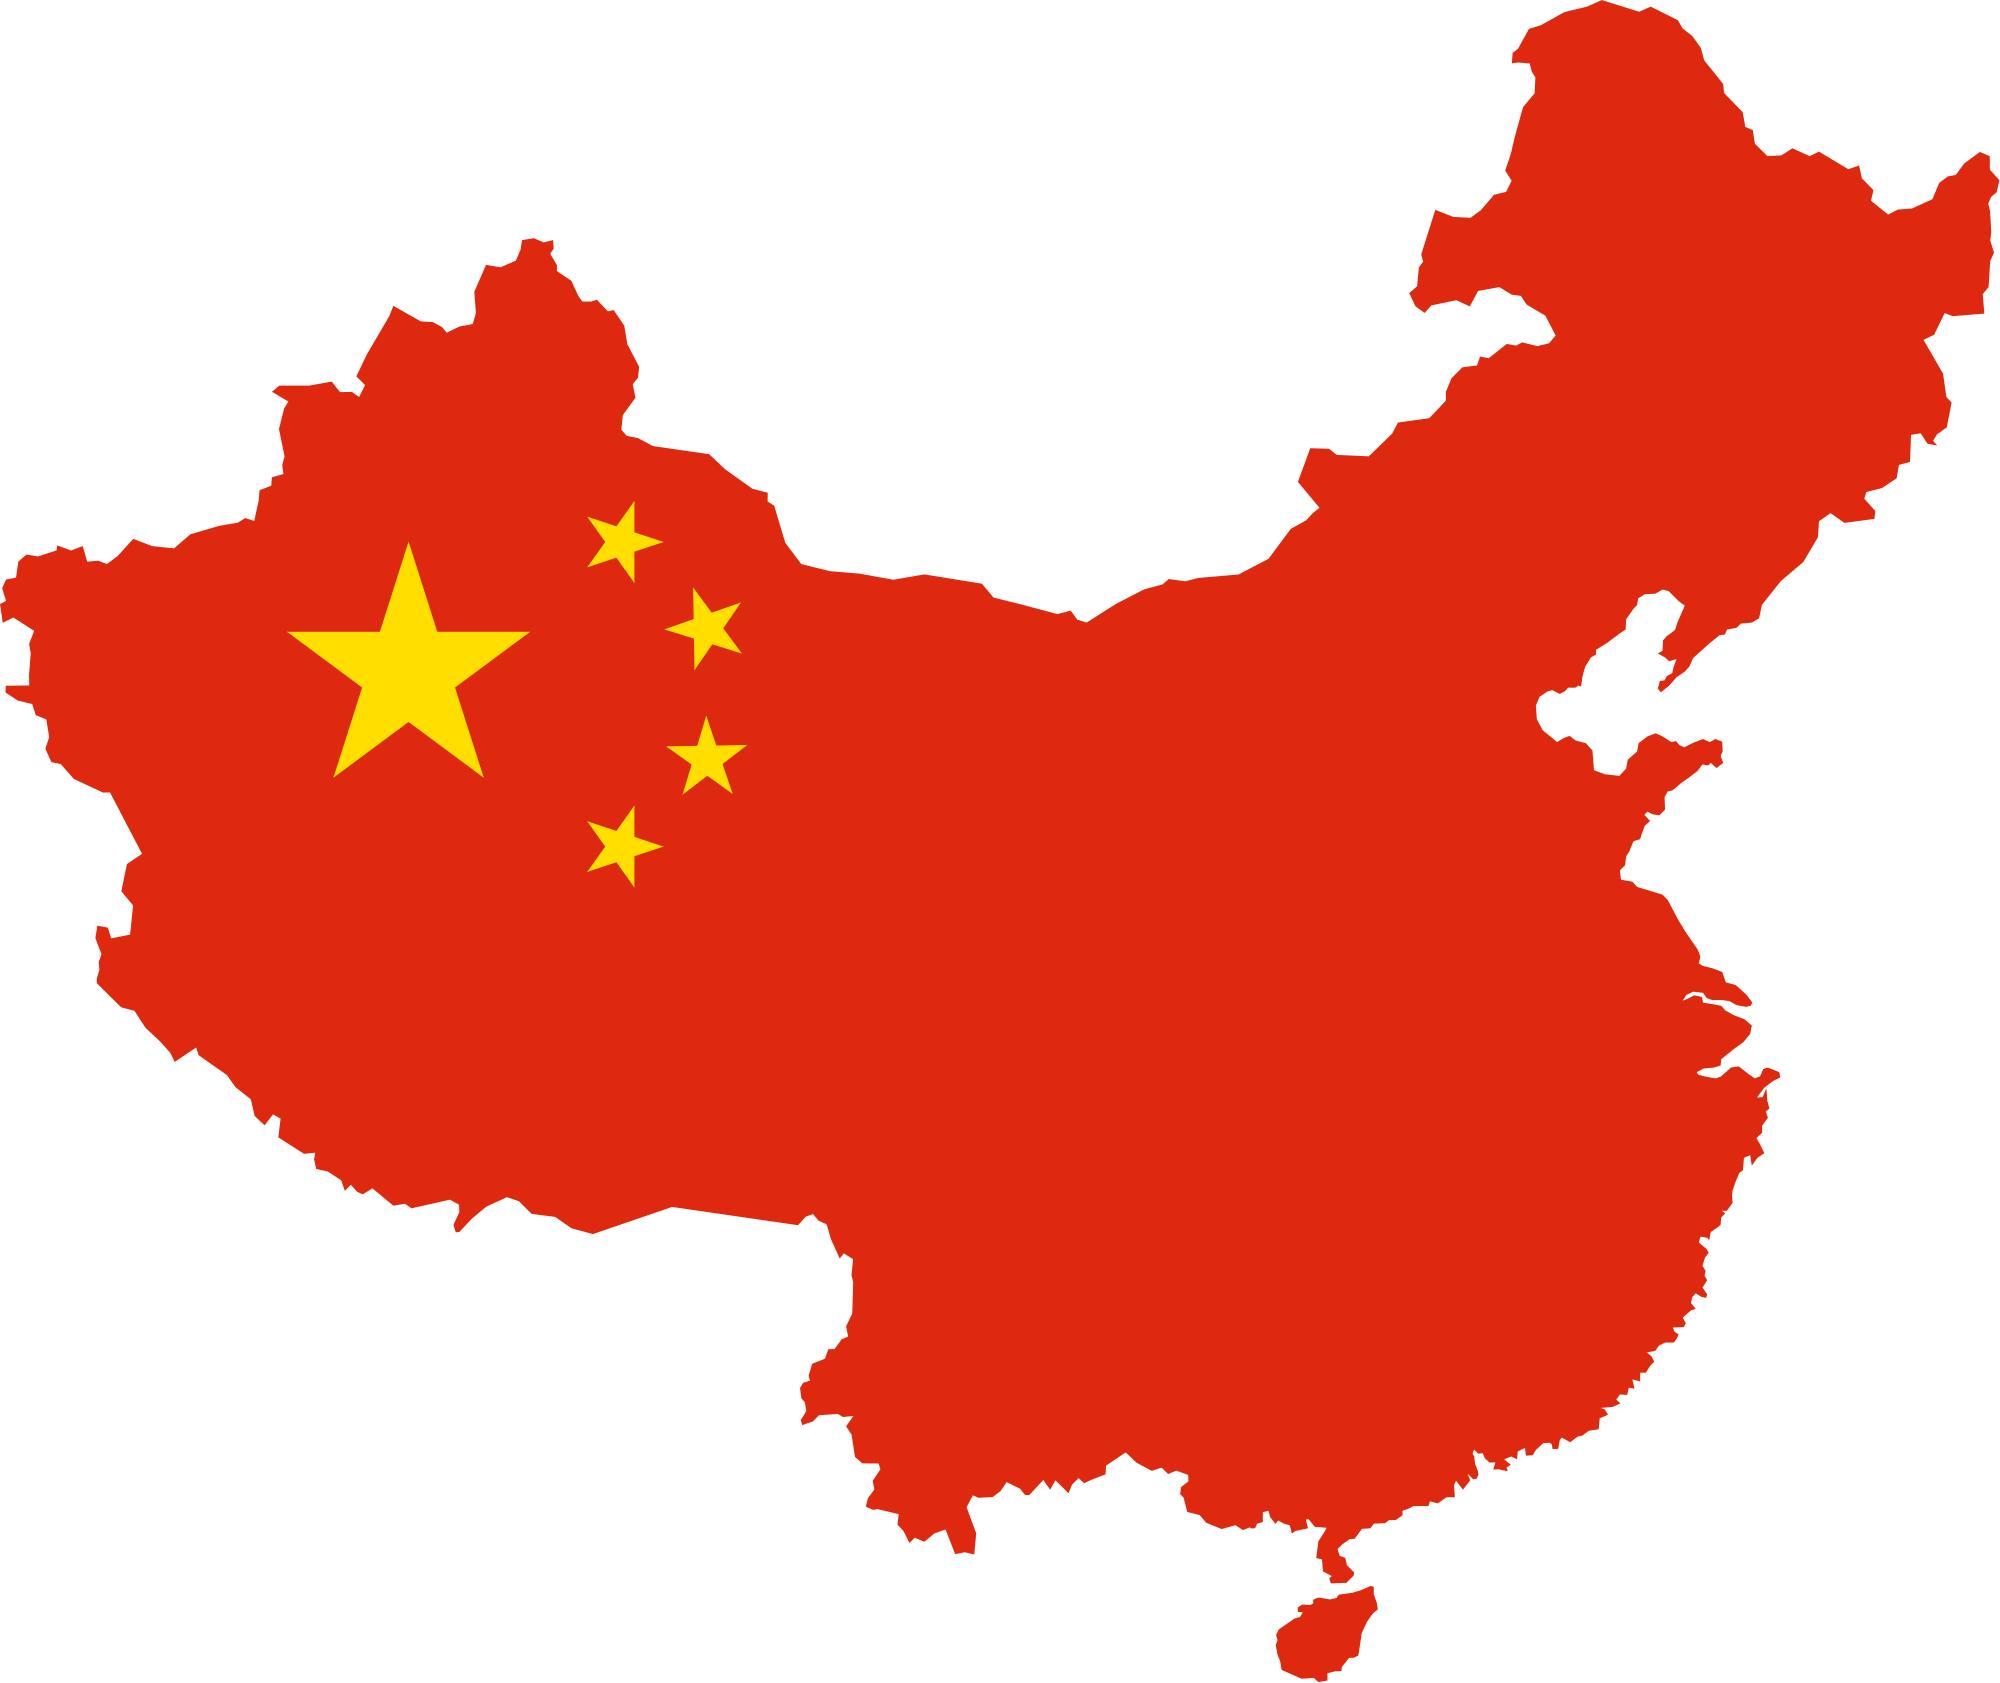 Chinois - Apprendre à compter